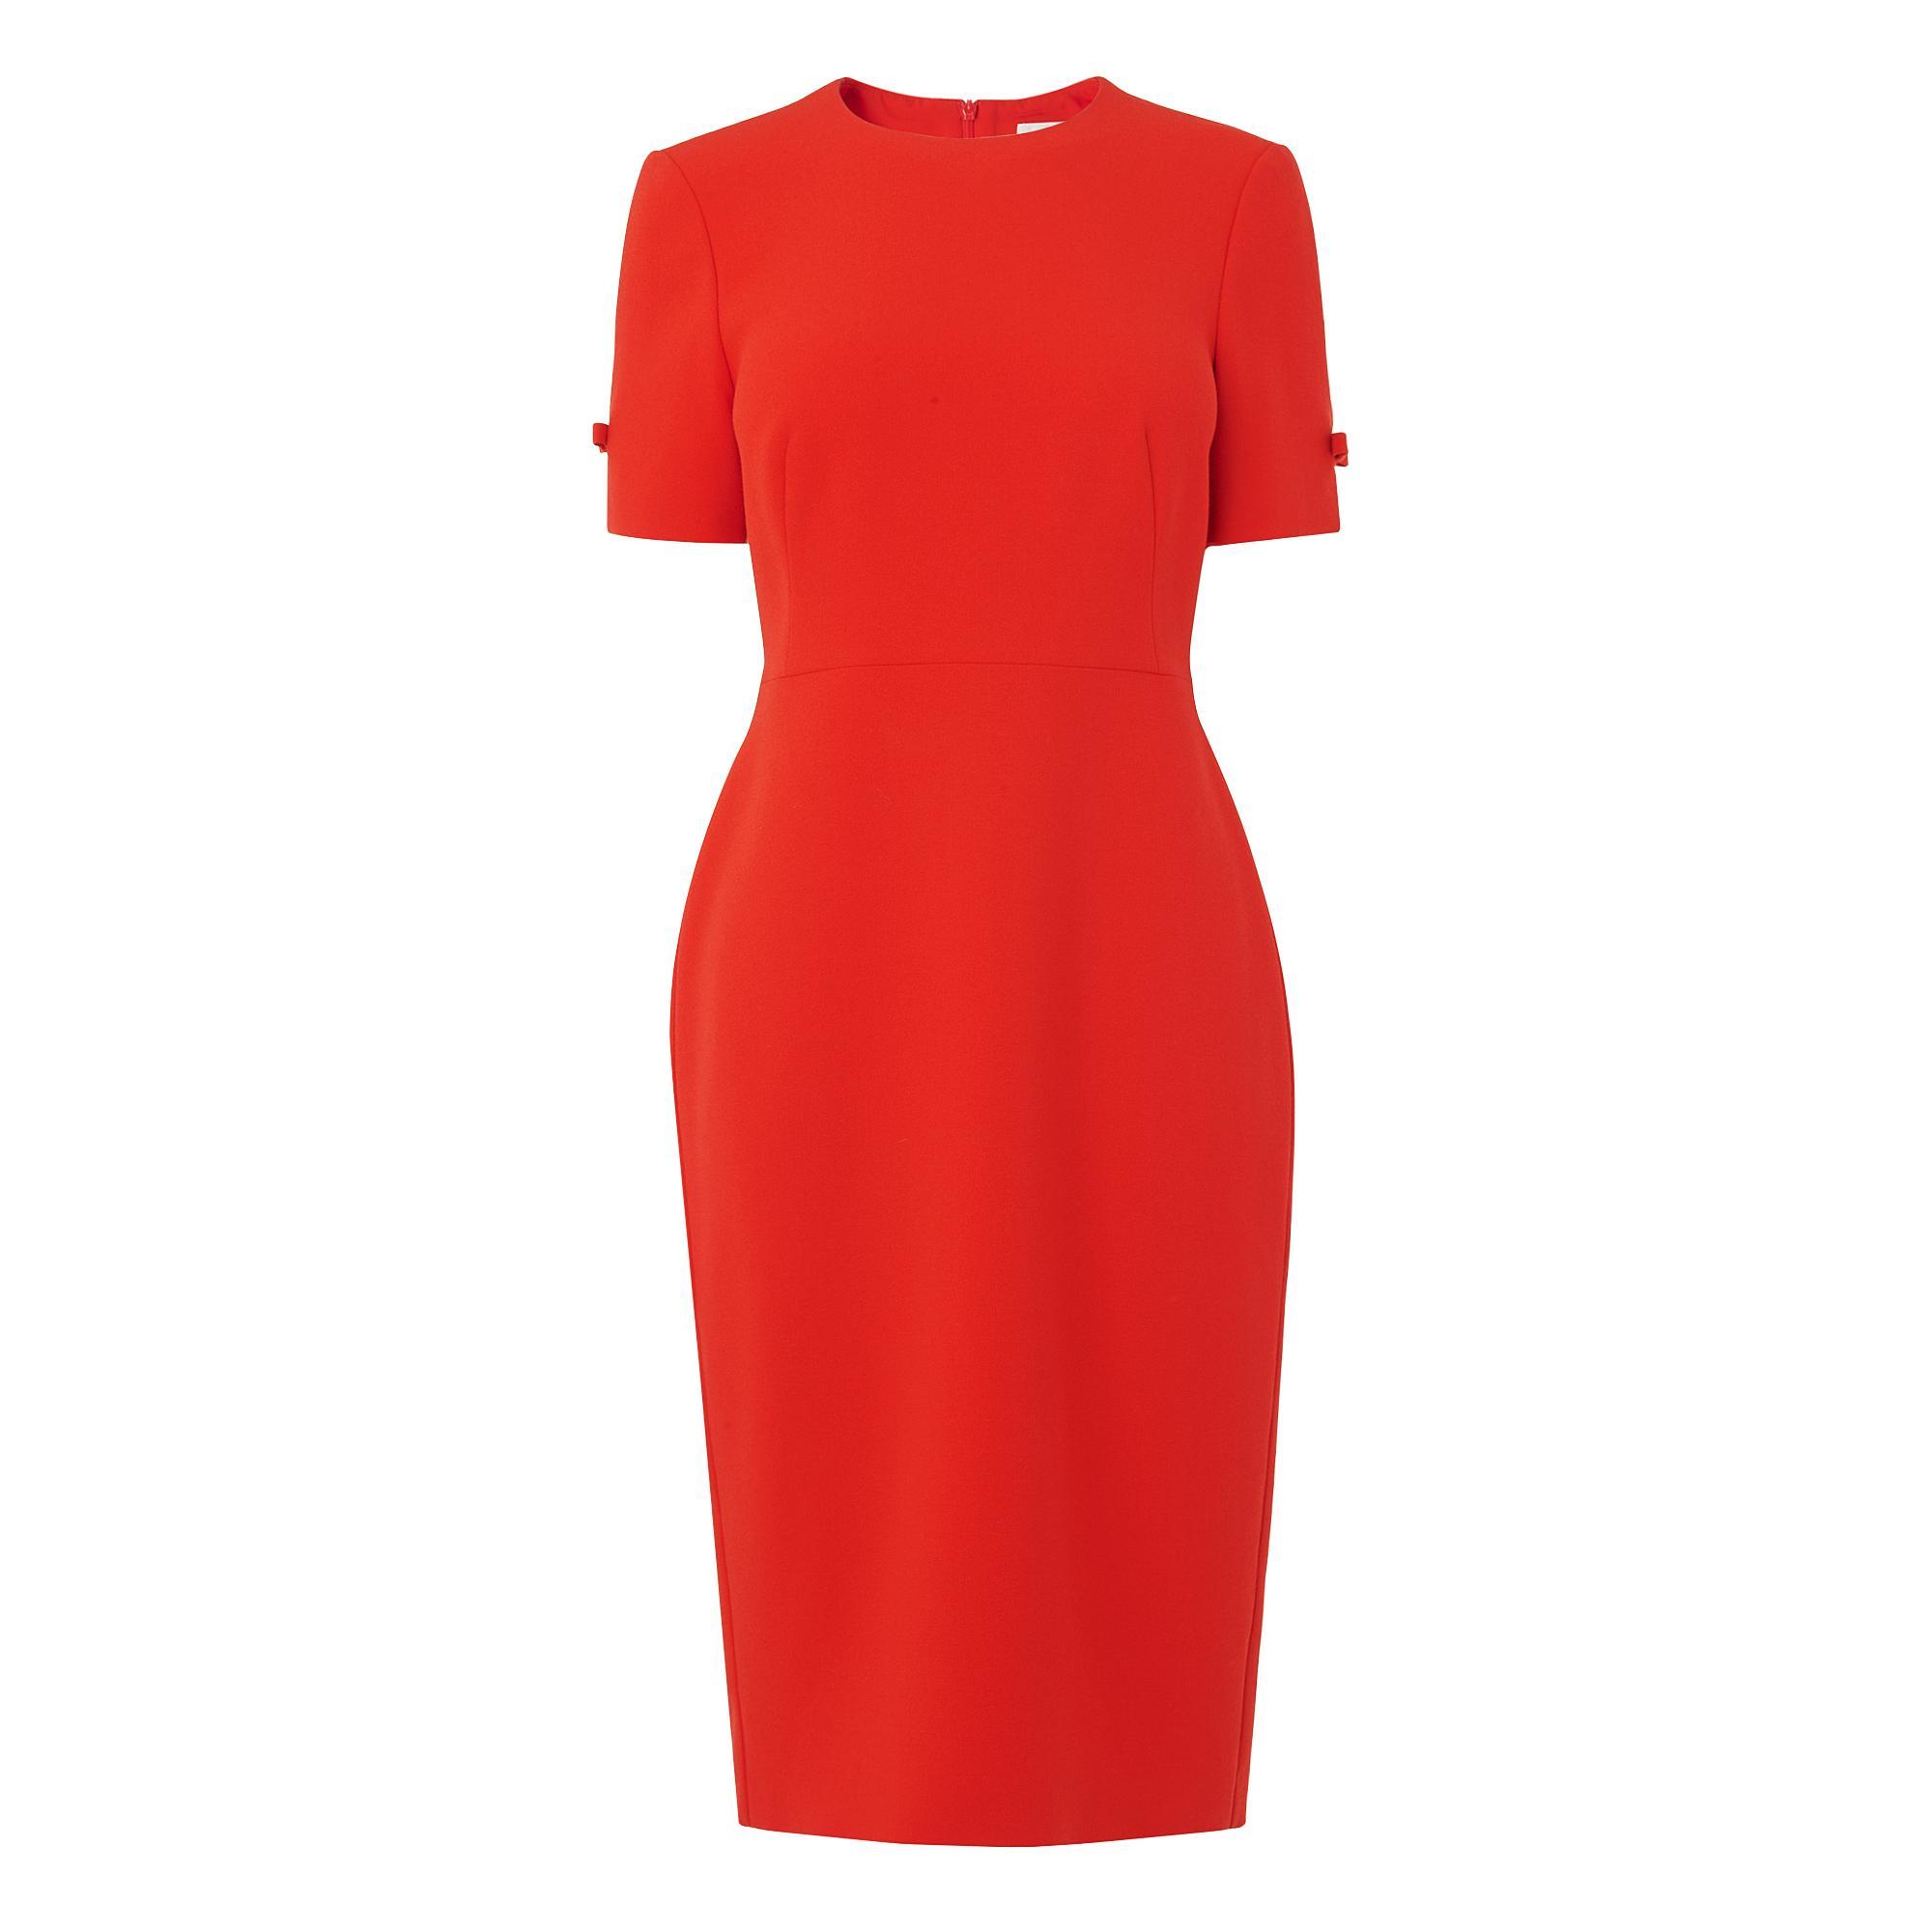 Trinu Red Dress